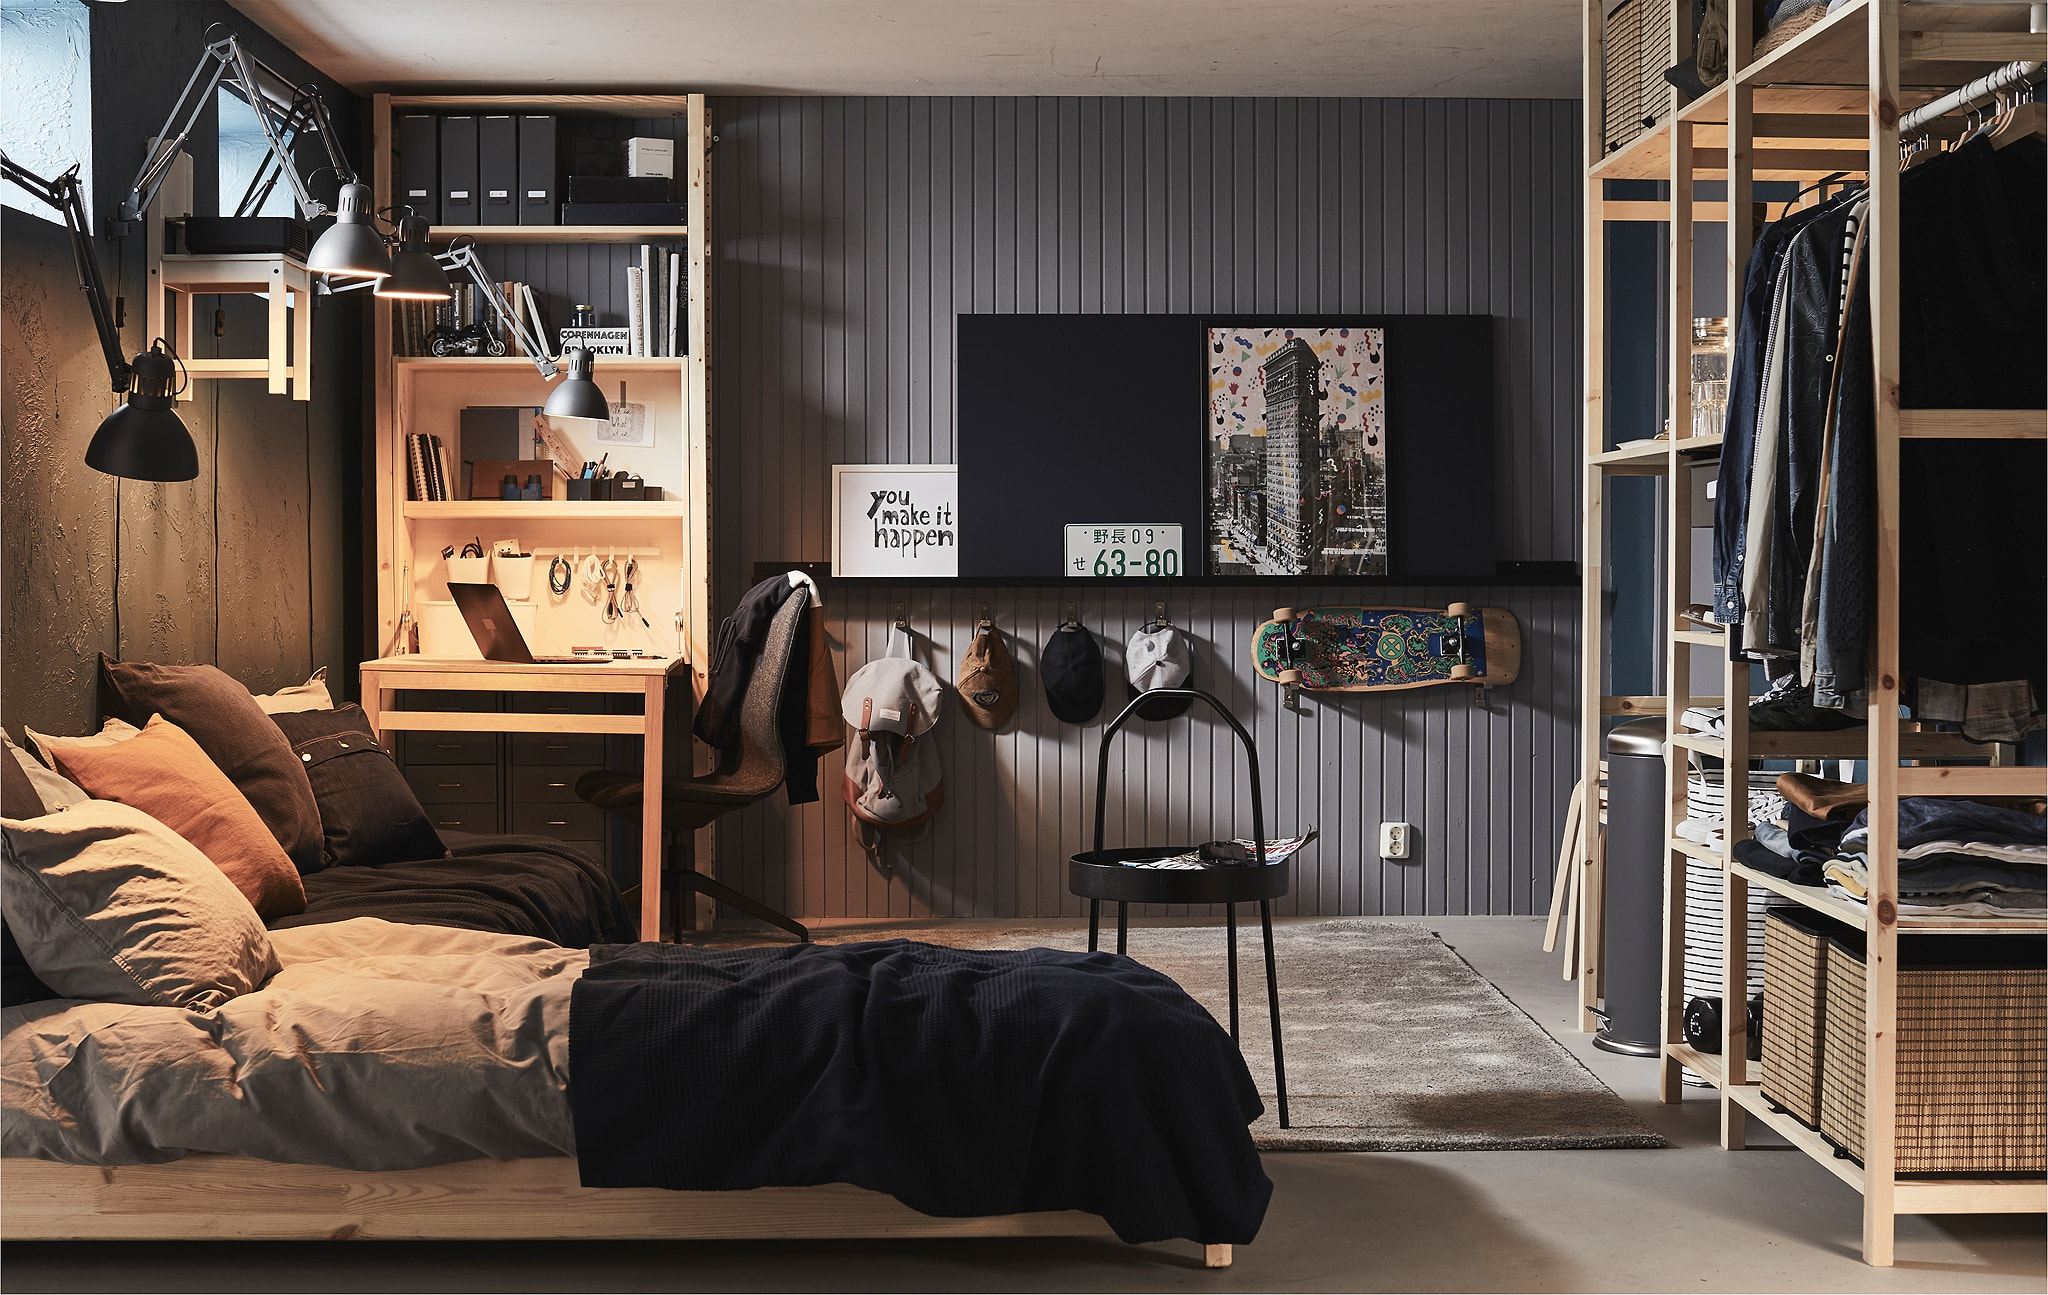 Ruang berperabot lengkap dengan jendela tinggi, seperti berada di basement atau garasi, dengan tempat tidur, meja kerja dan berbagai ruang penyimpanan.